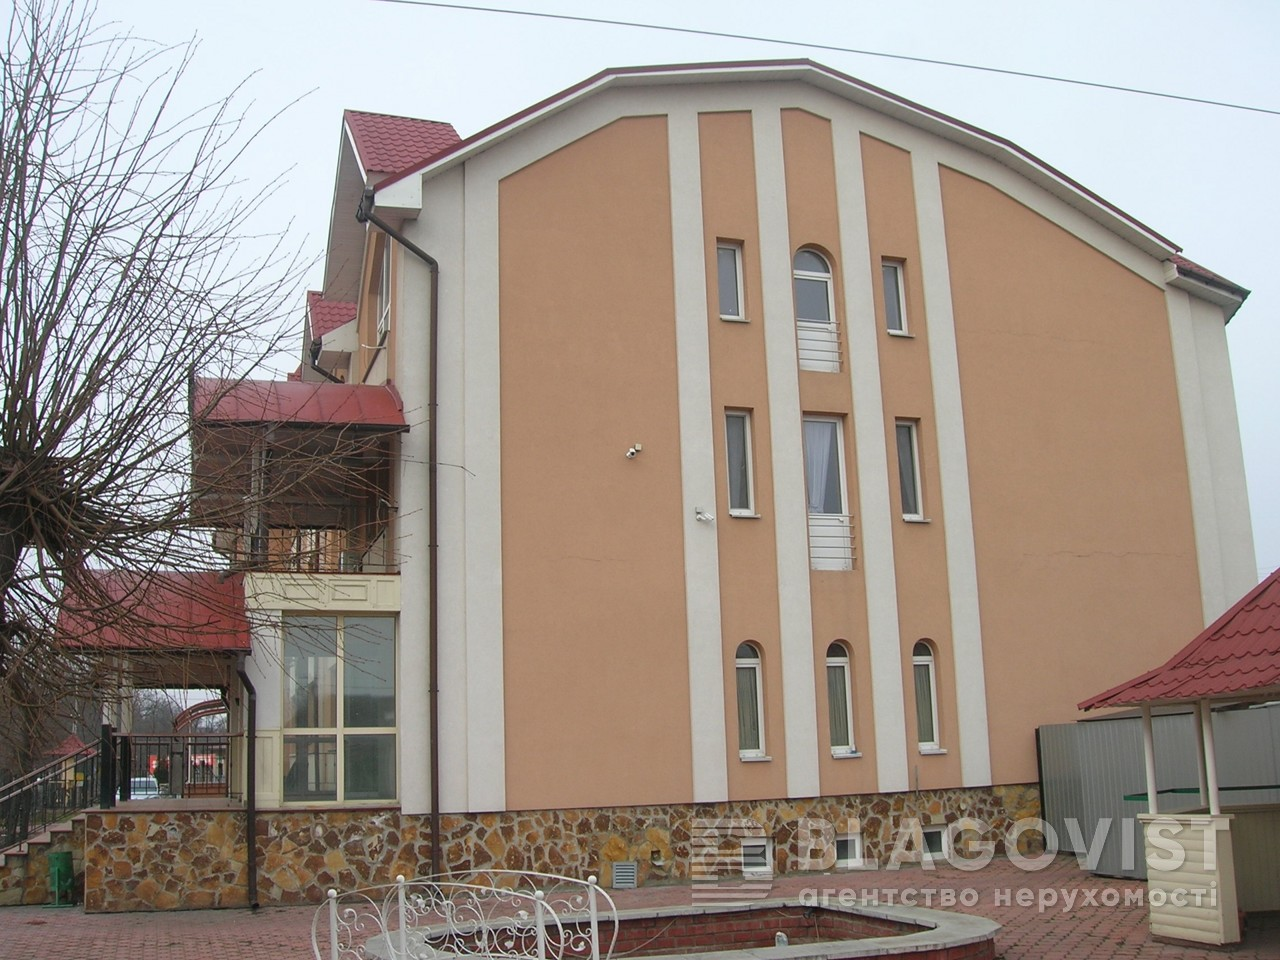 Готель, P-23334, Білгородська, Боярка - Фото 2